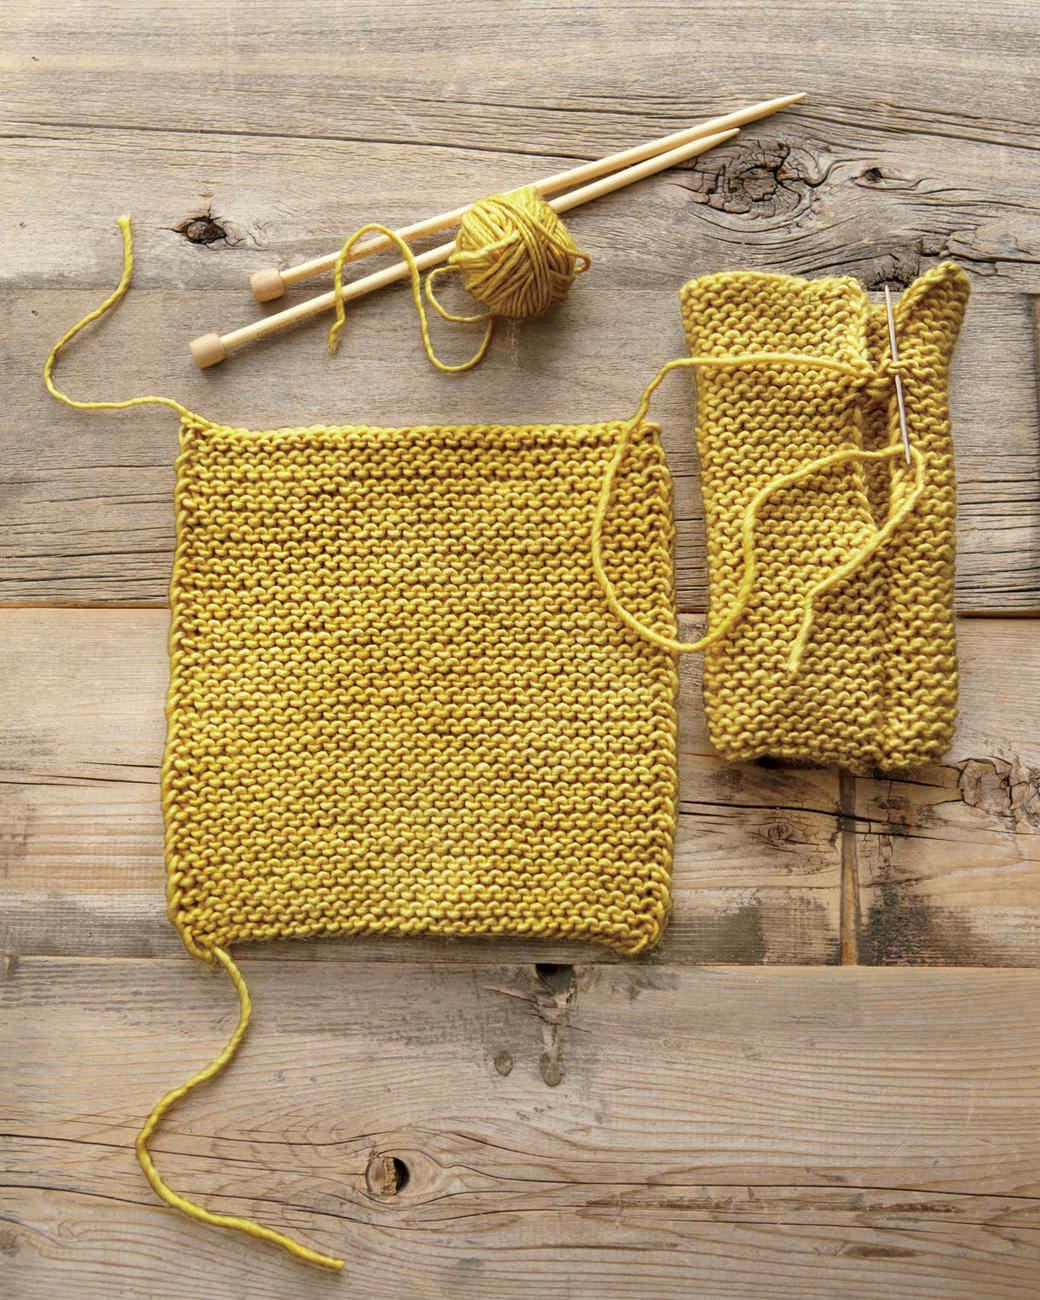 wool-mittens-md107386.jpg